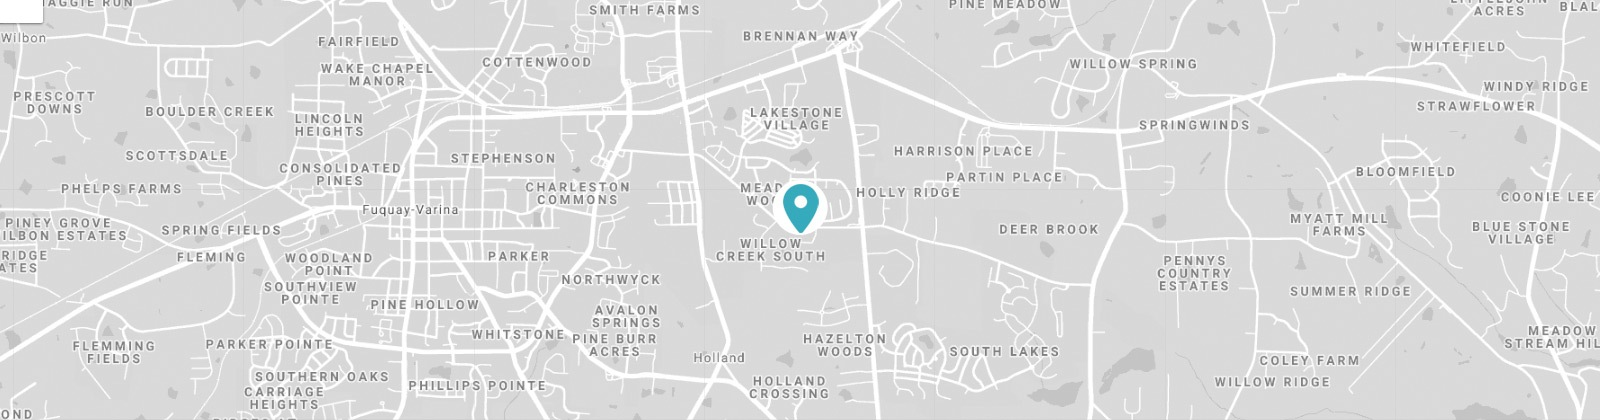 ClubWorx location map